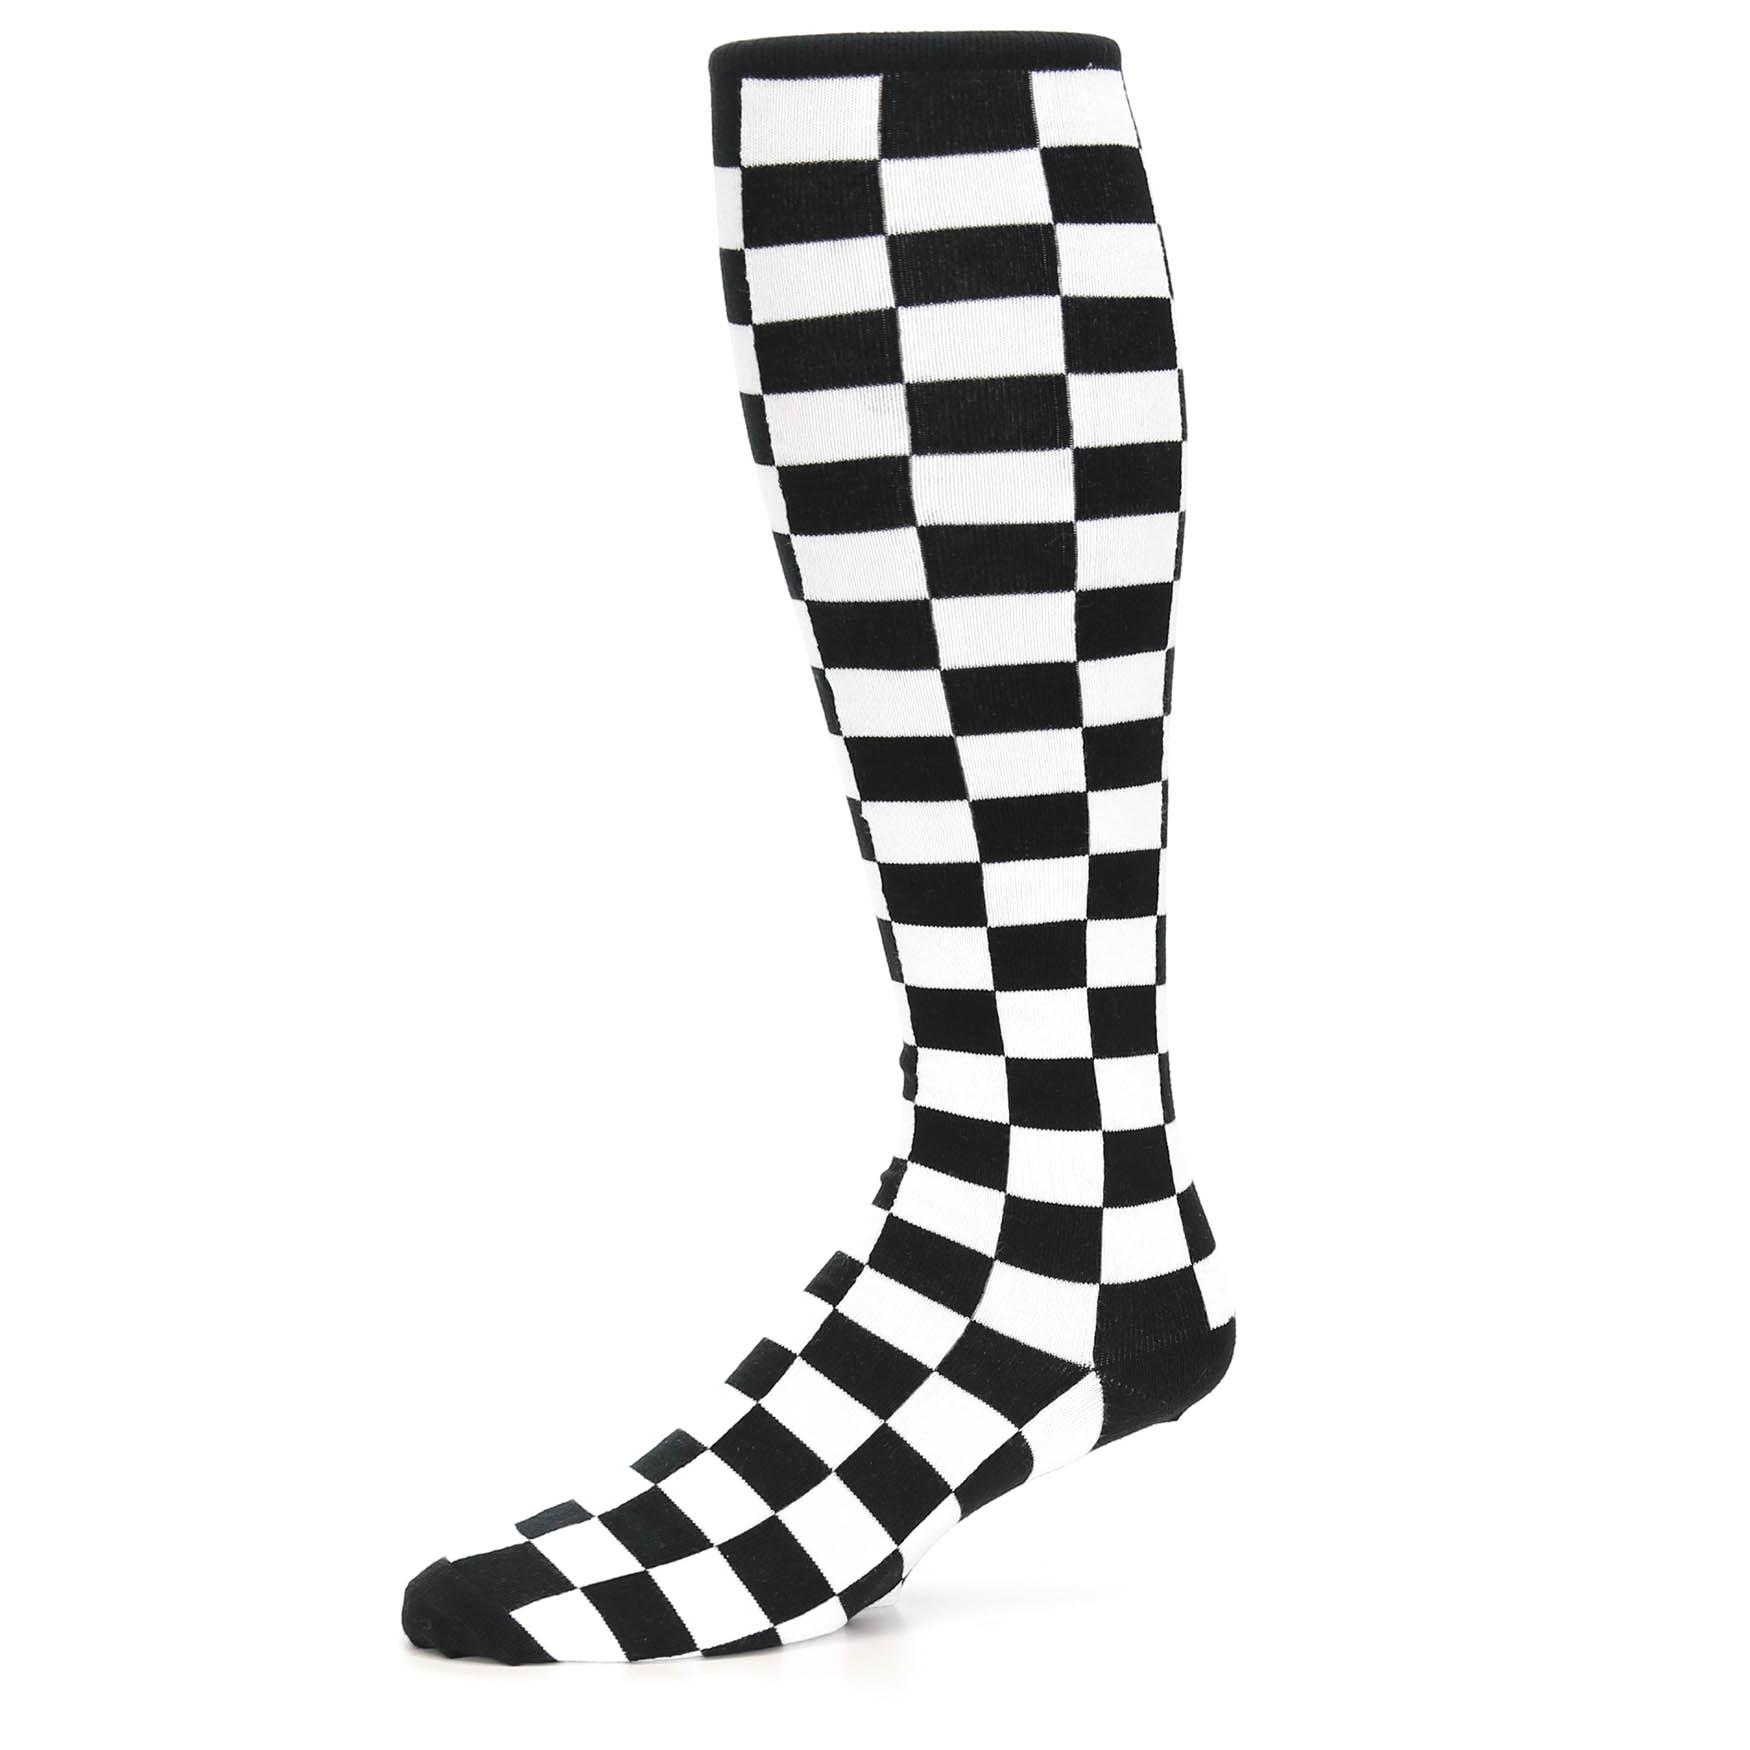 High Quality Black /& White Checked Socks